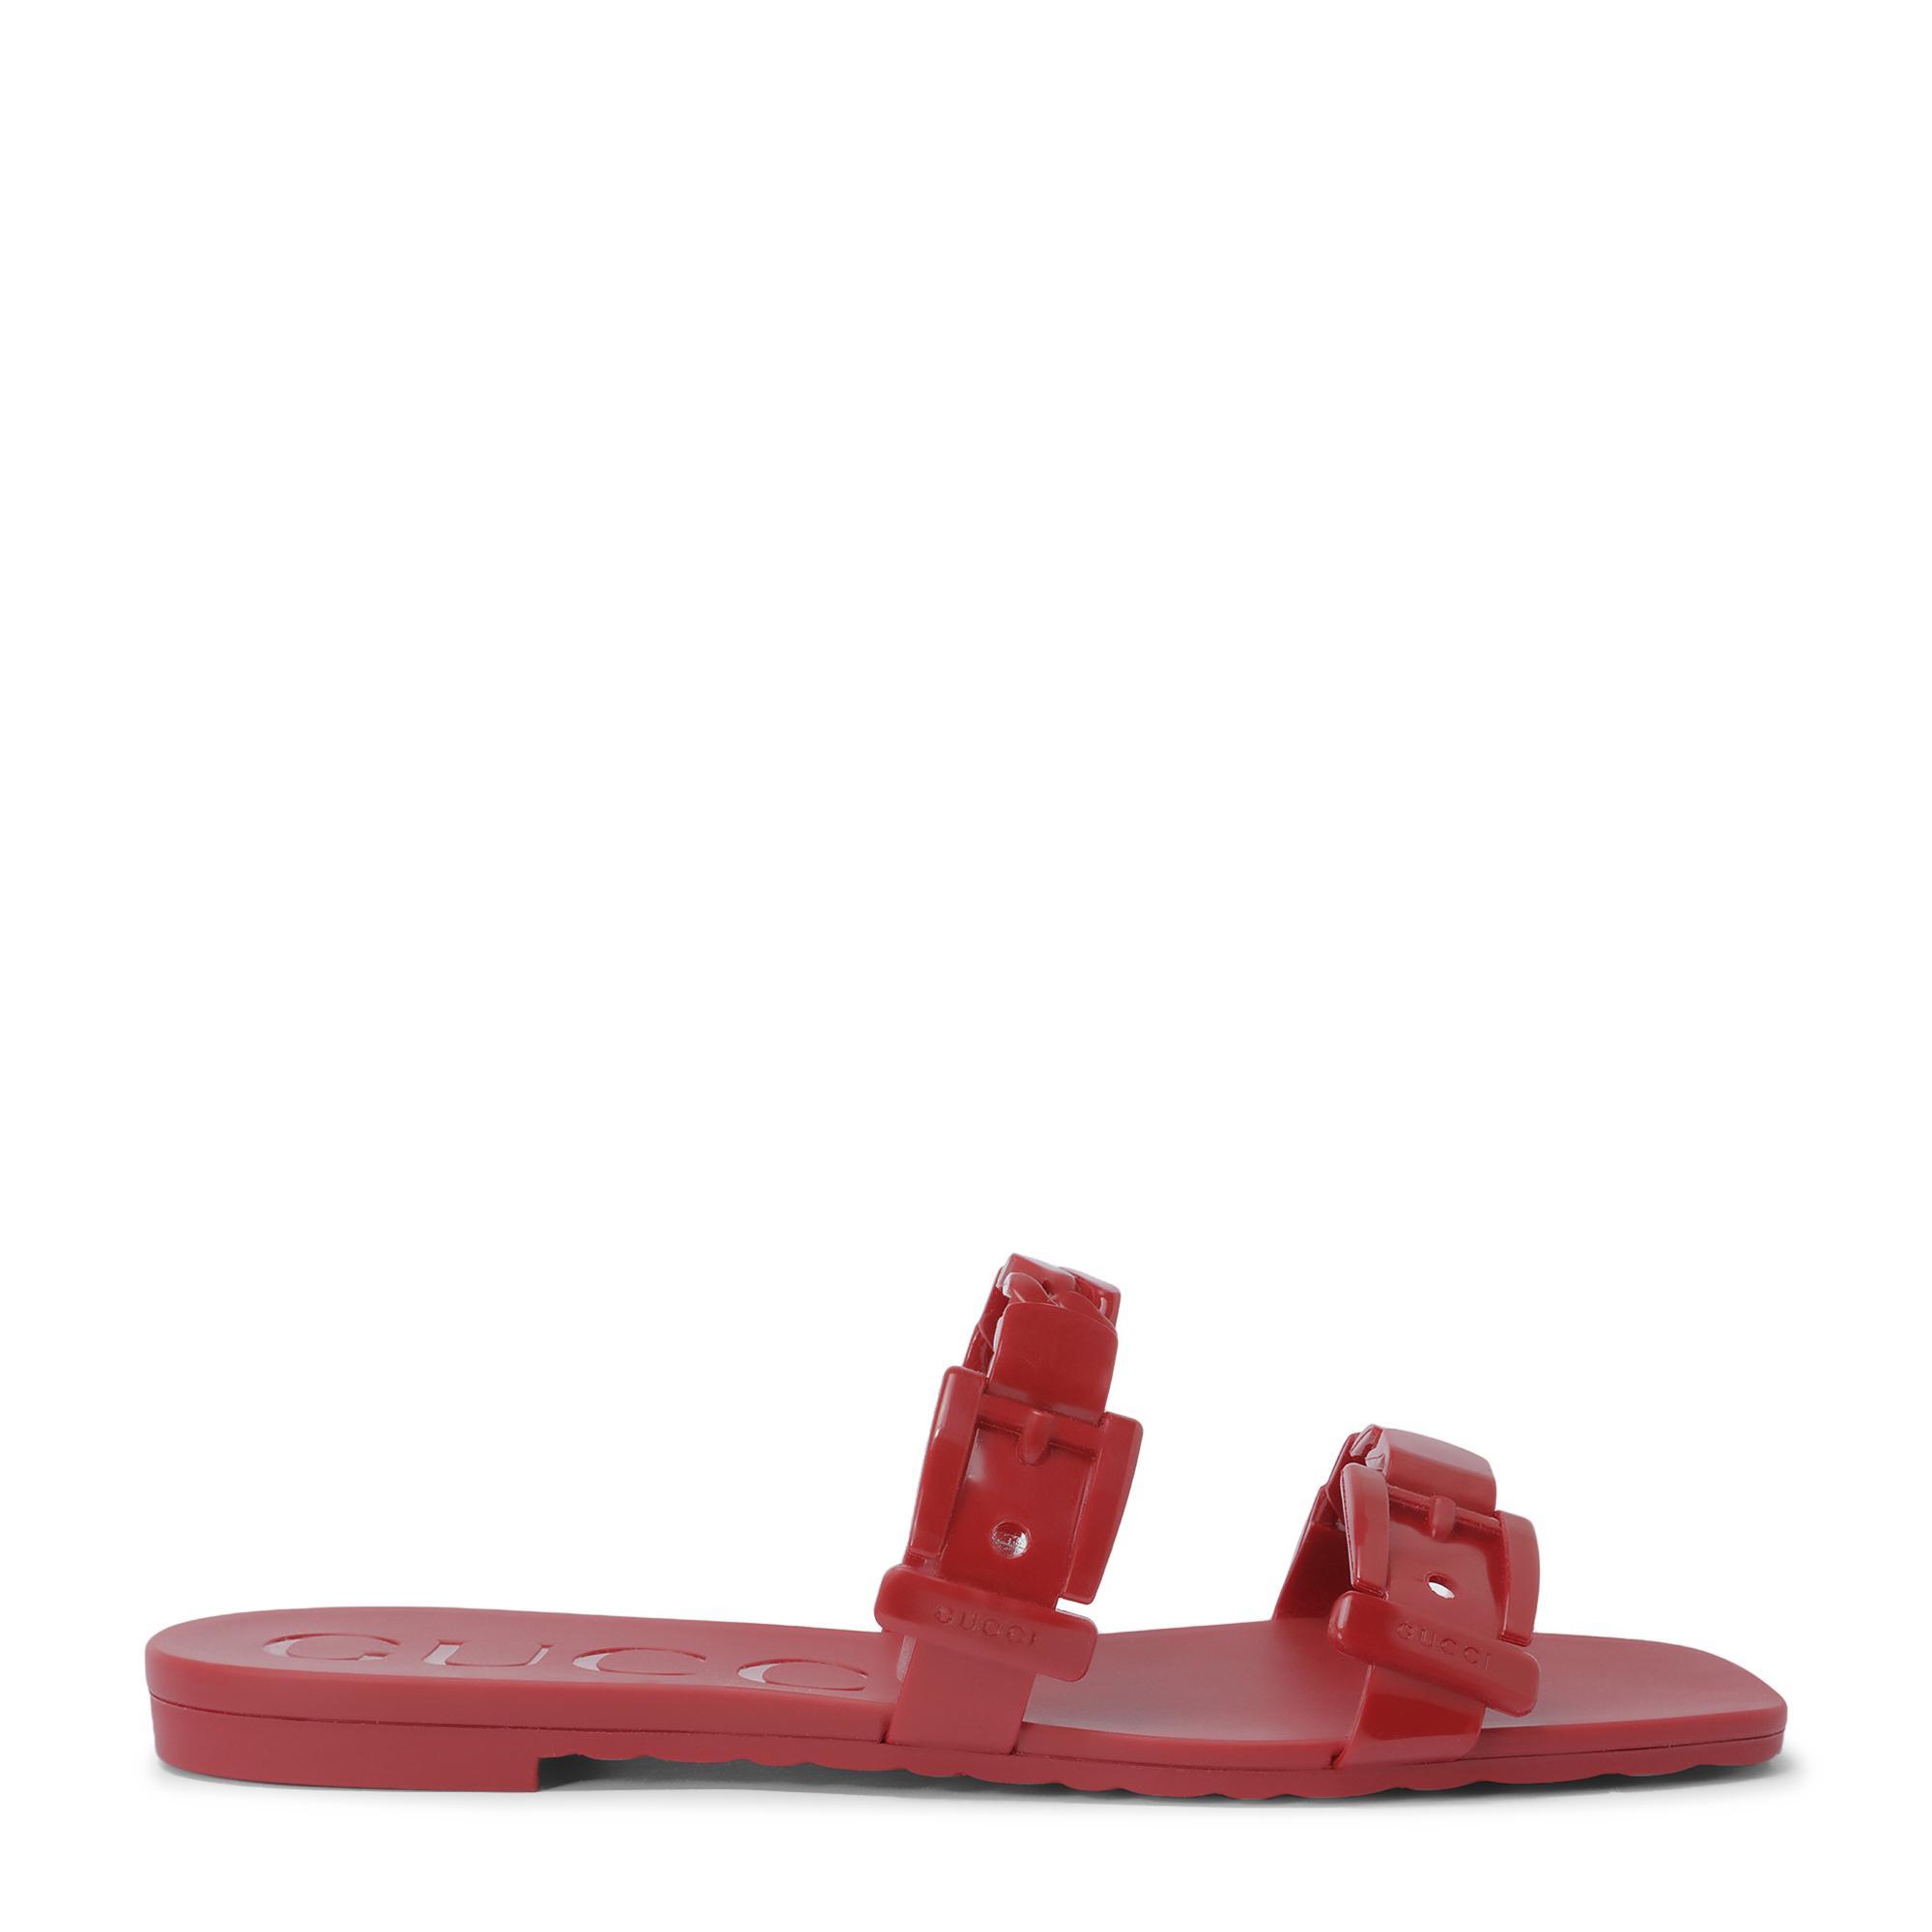 Rubber flat sandals